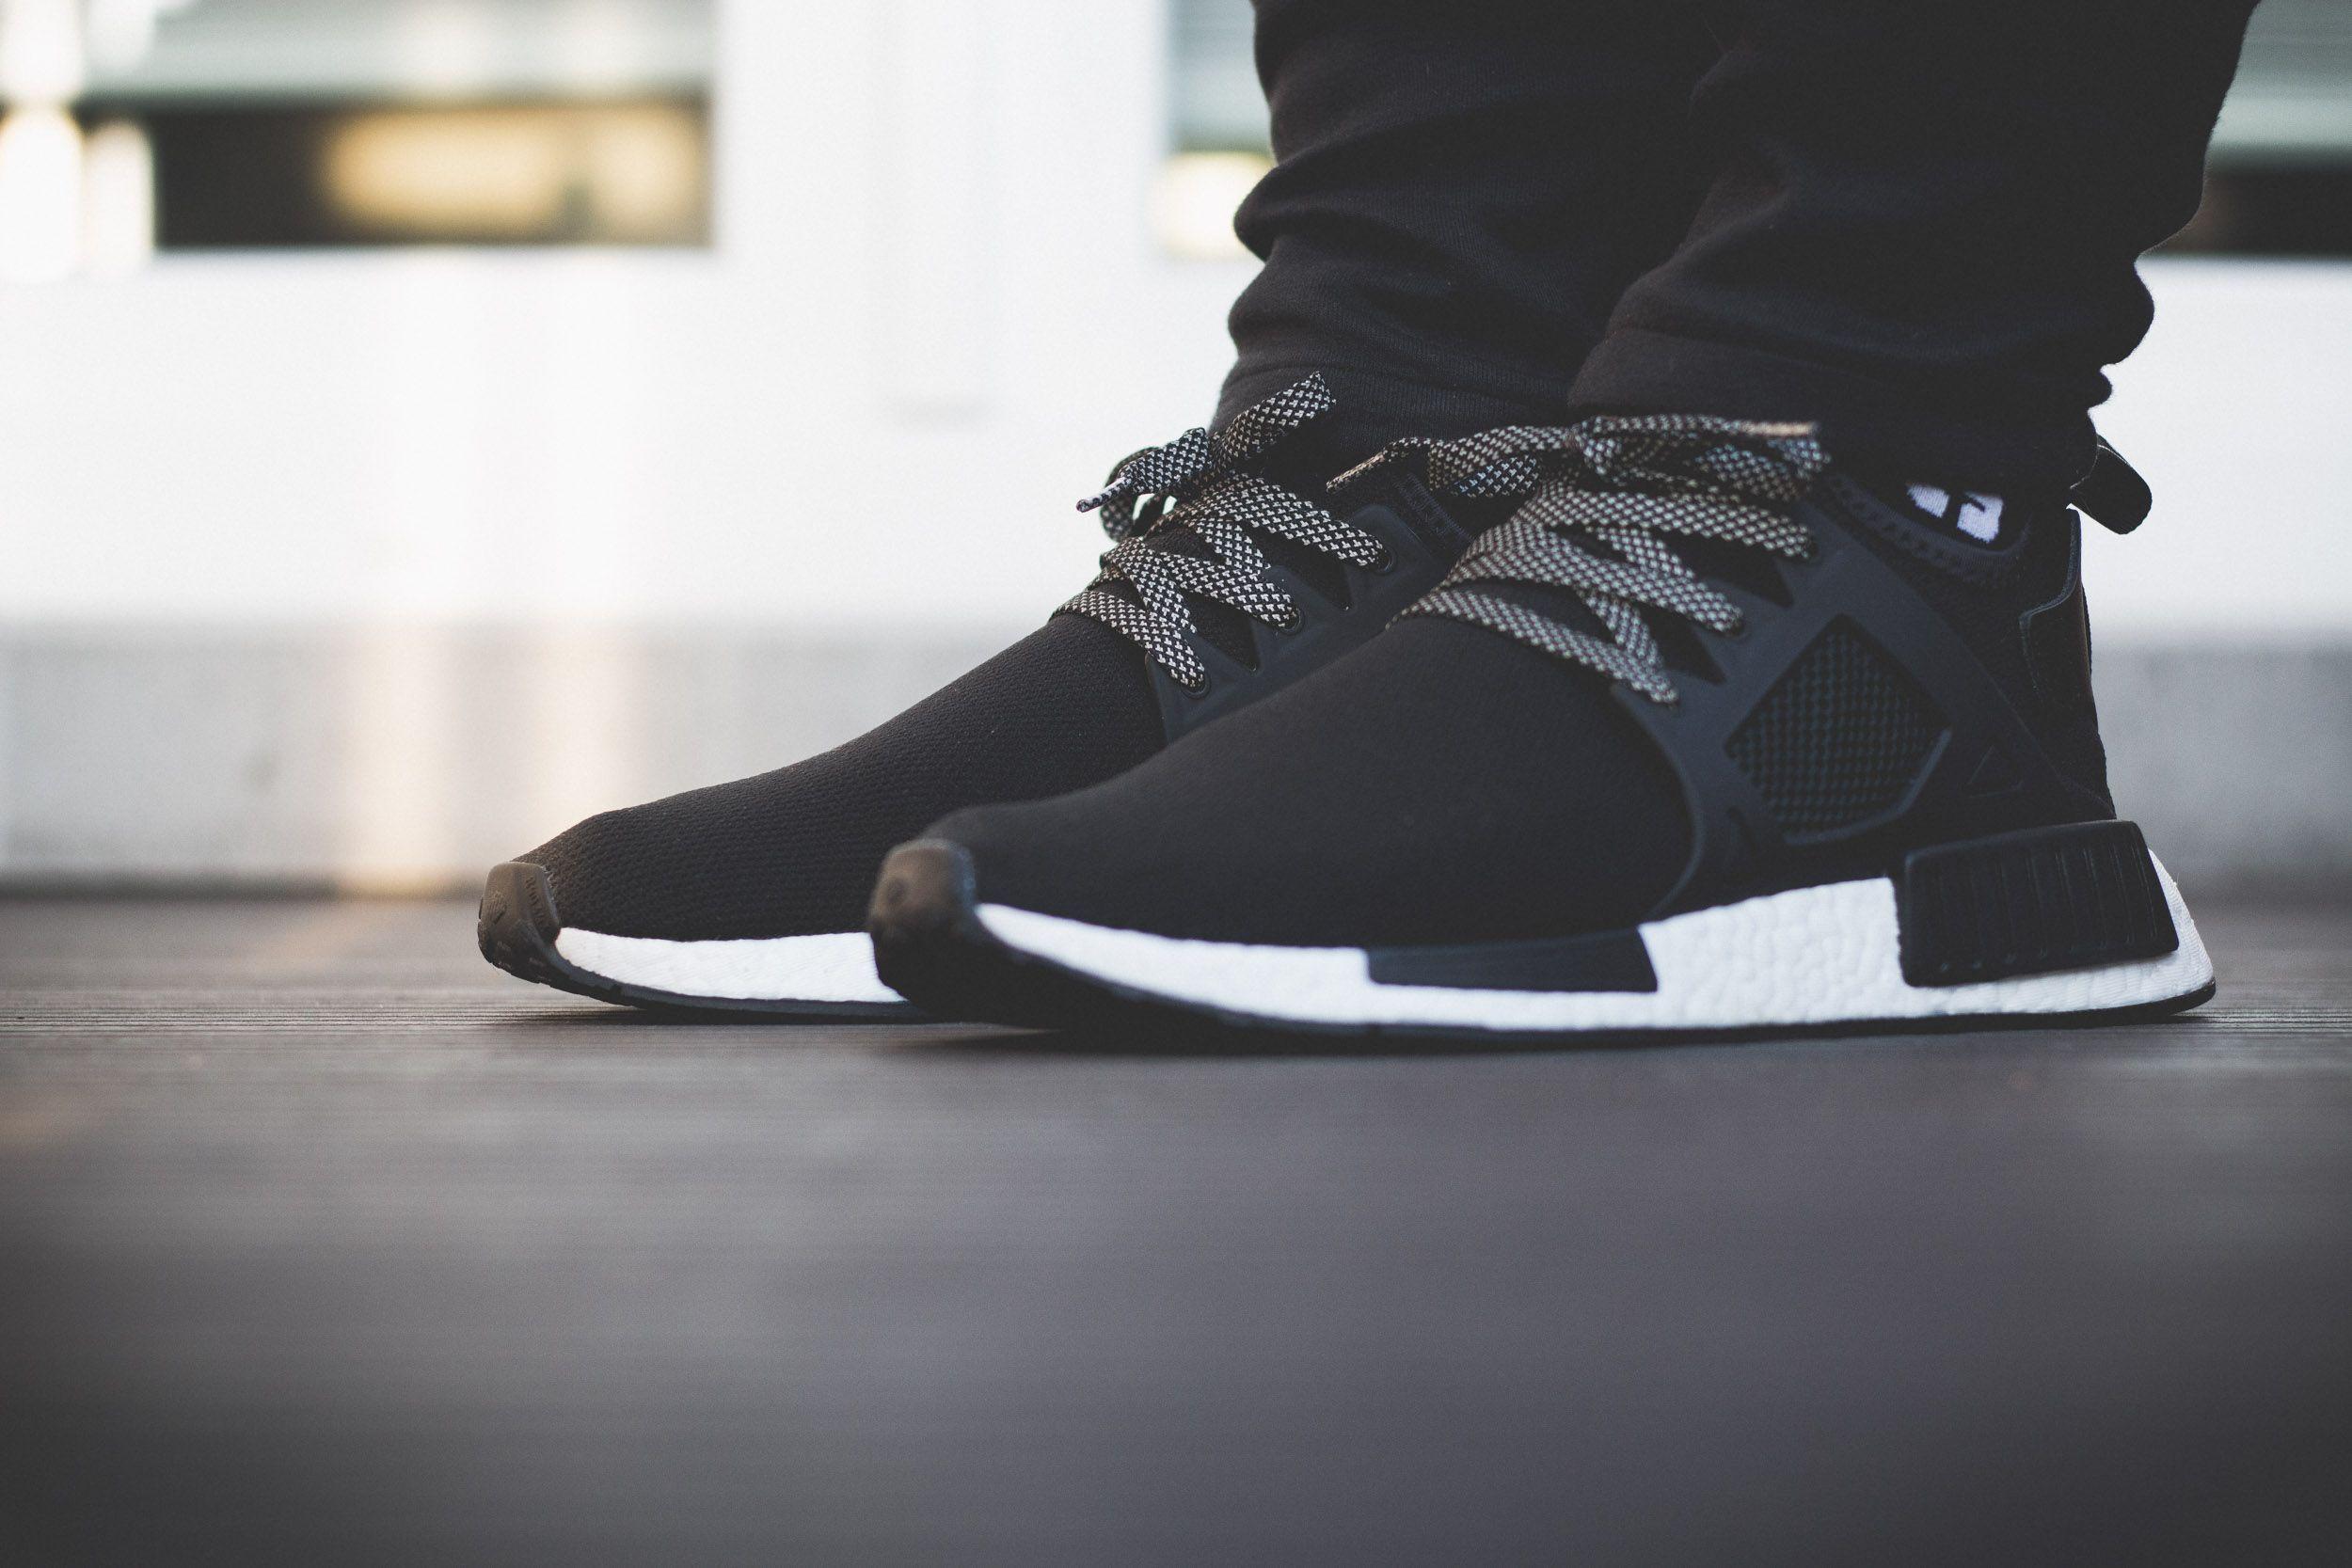 Adidas Nmd Xr1 Black White On Feet Adidas Adidasoriginals